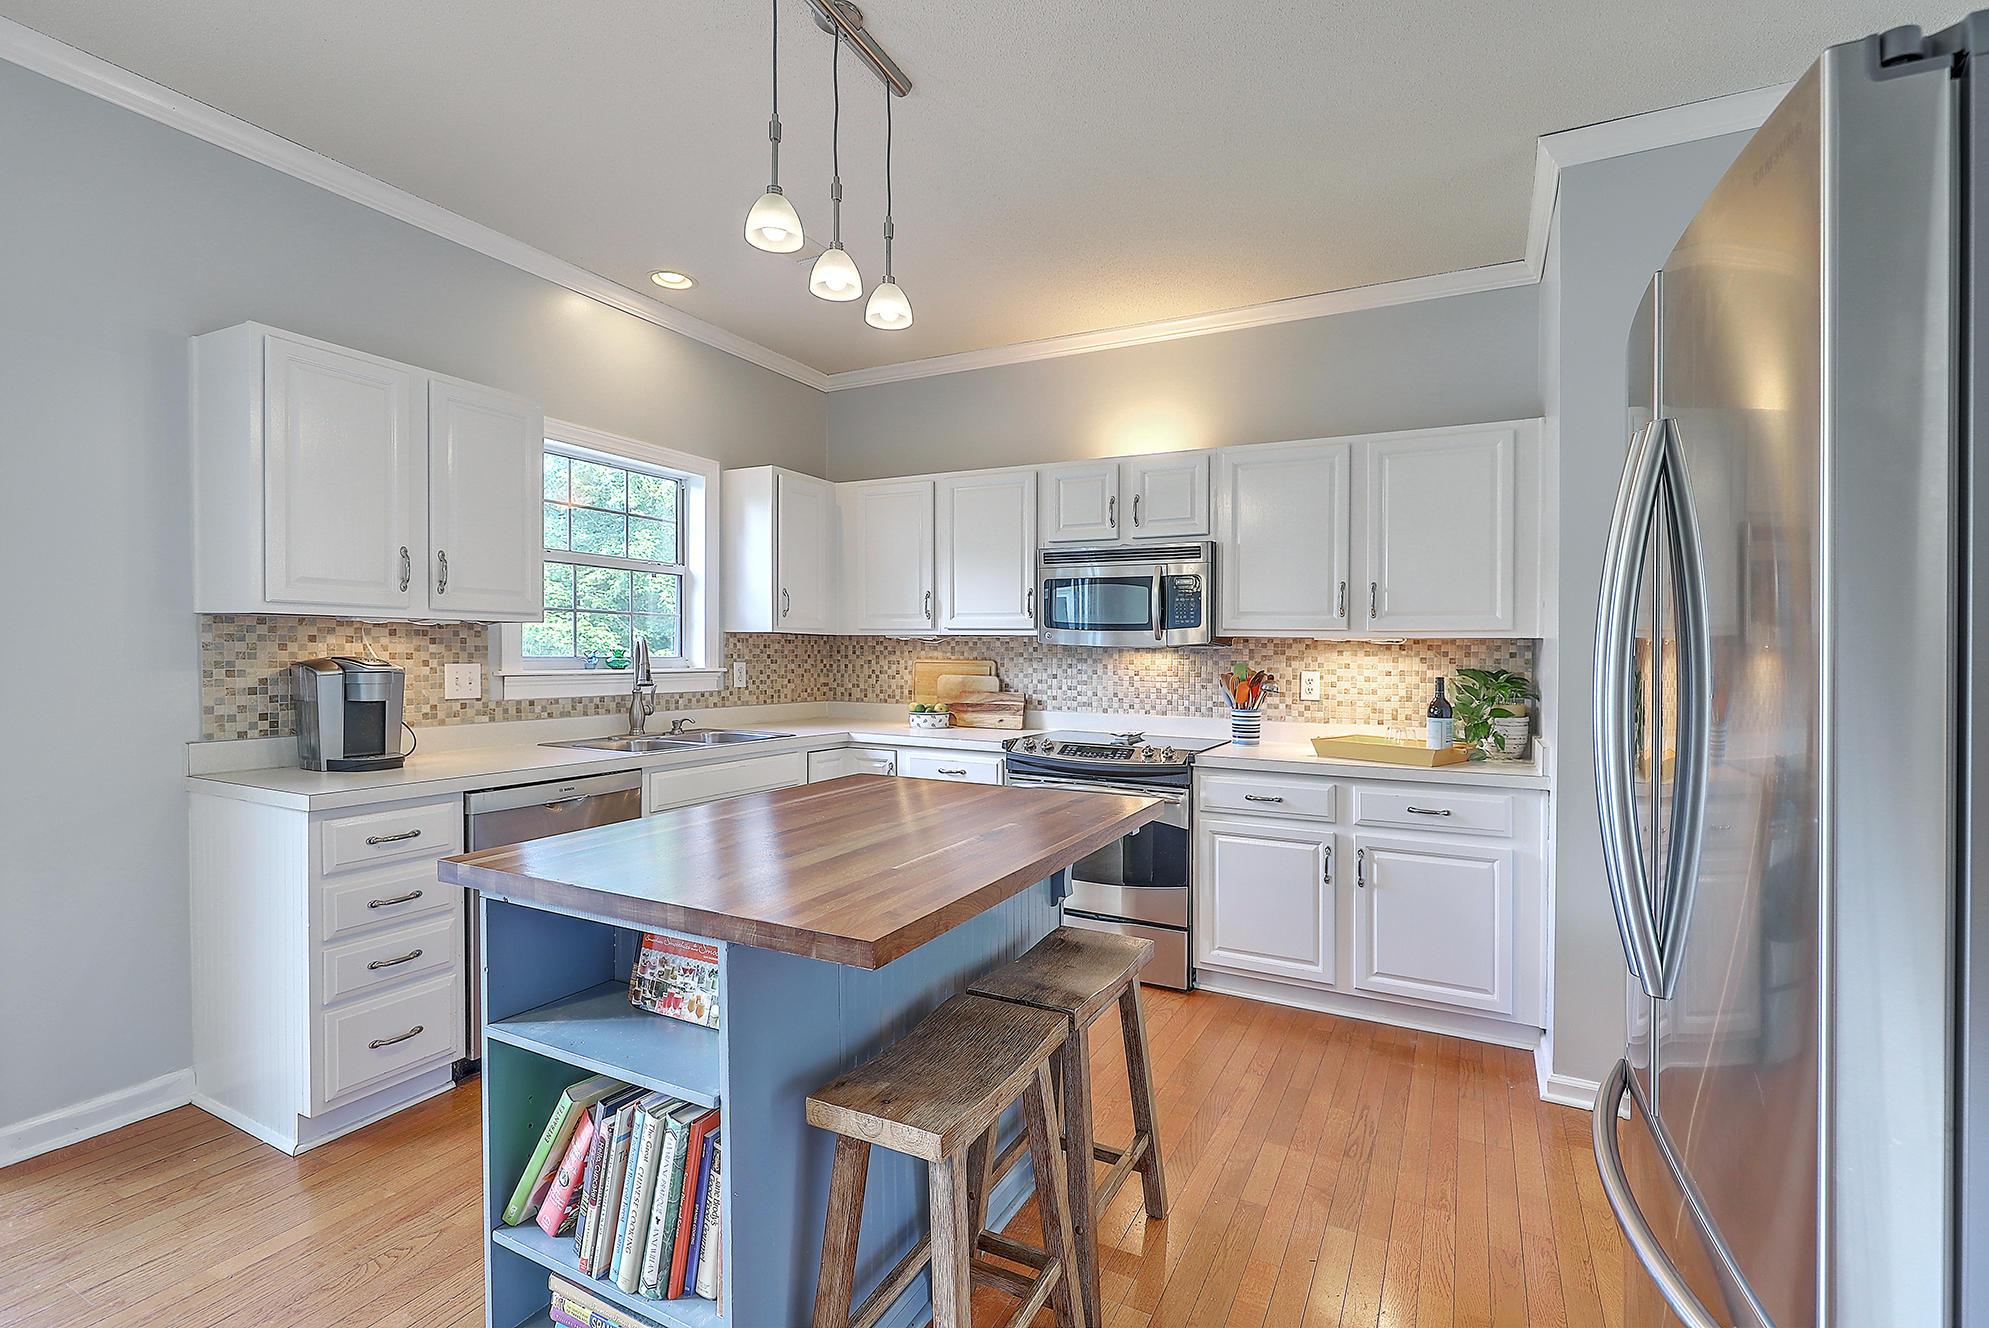 Belle Hall Homes For Sale - 106 Revolution, Mount Pleasant, SC - 31